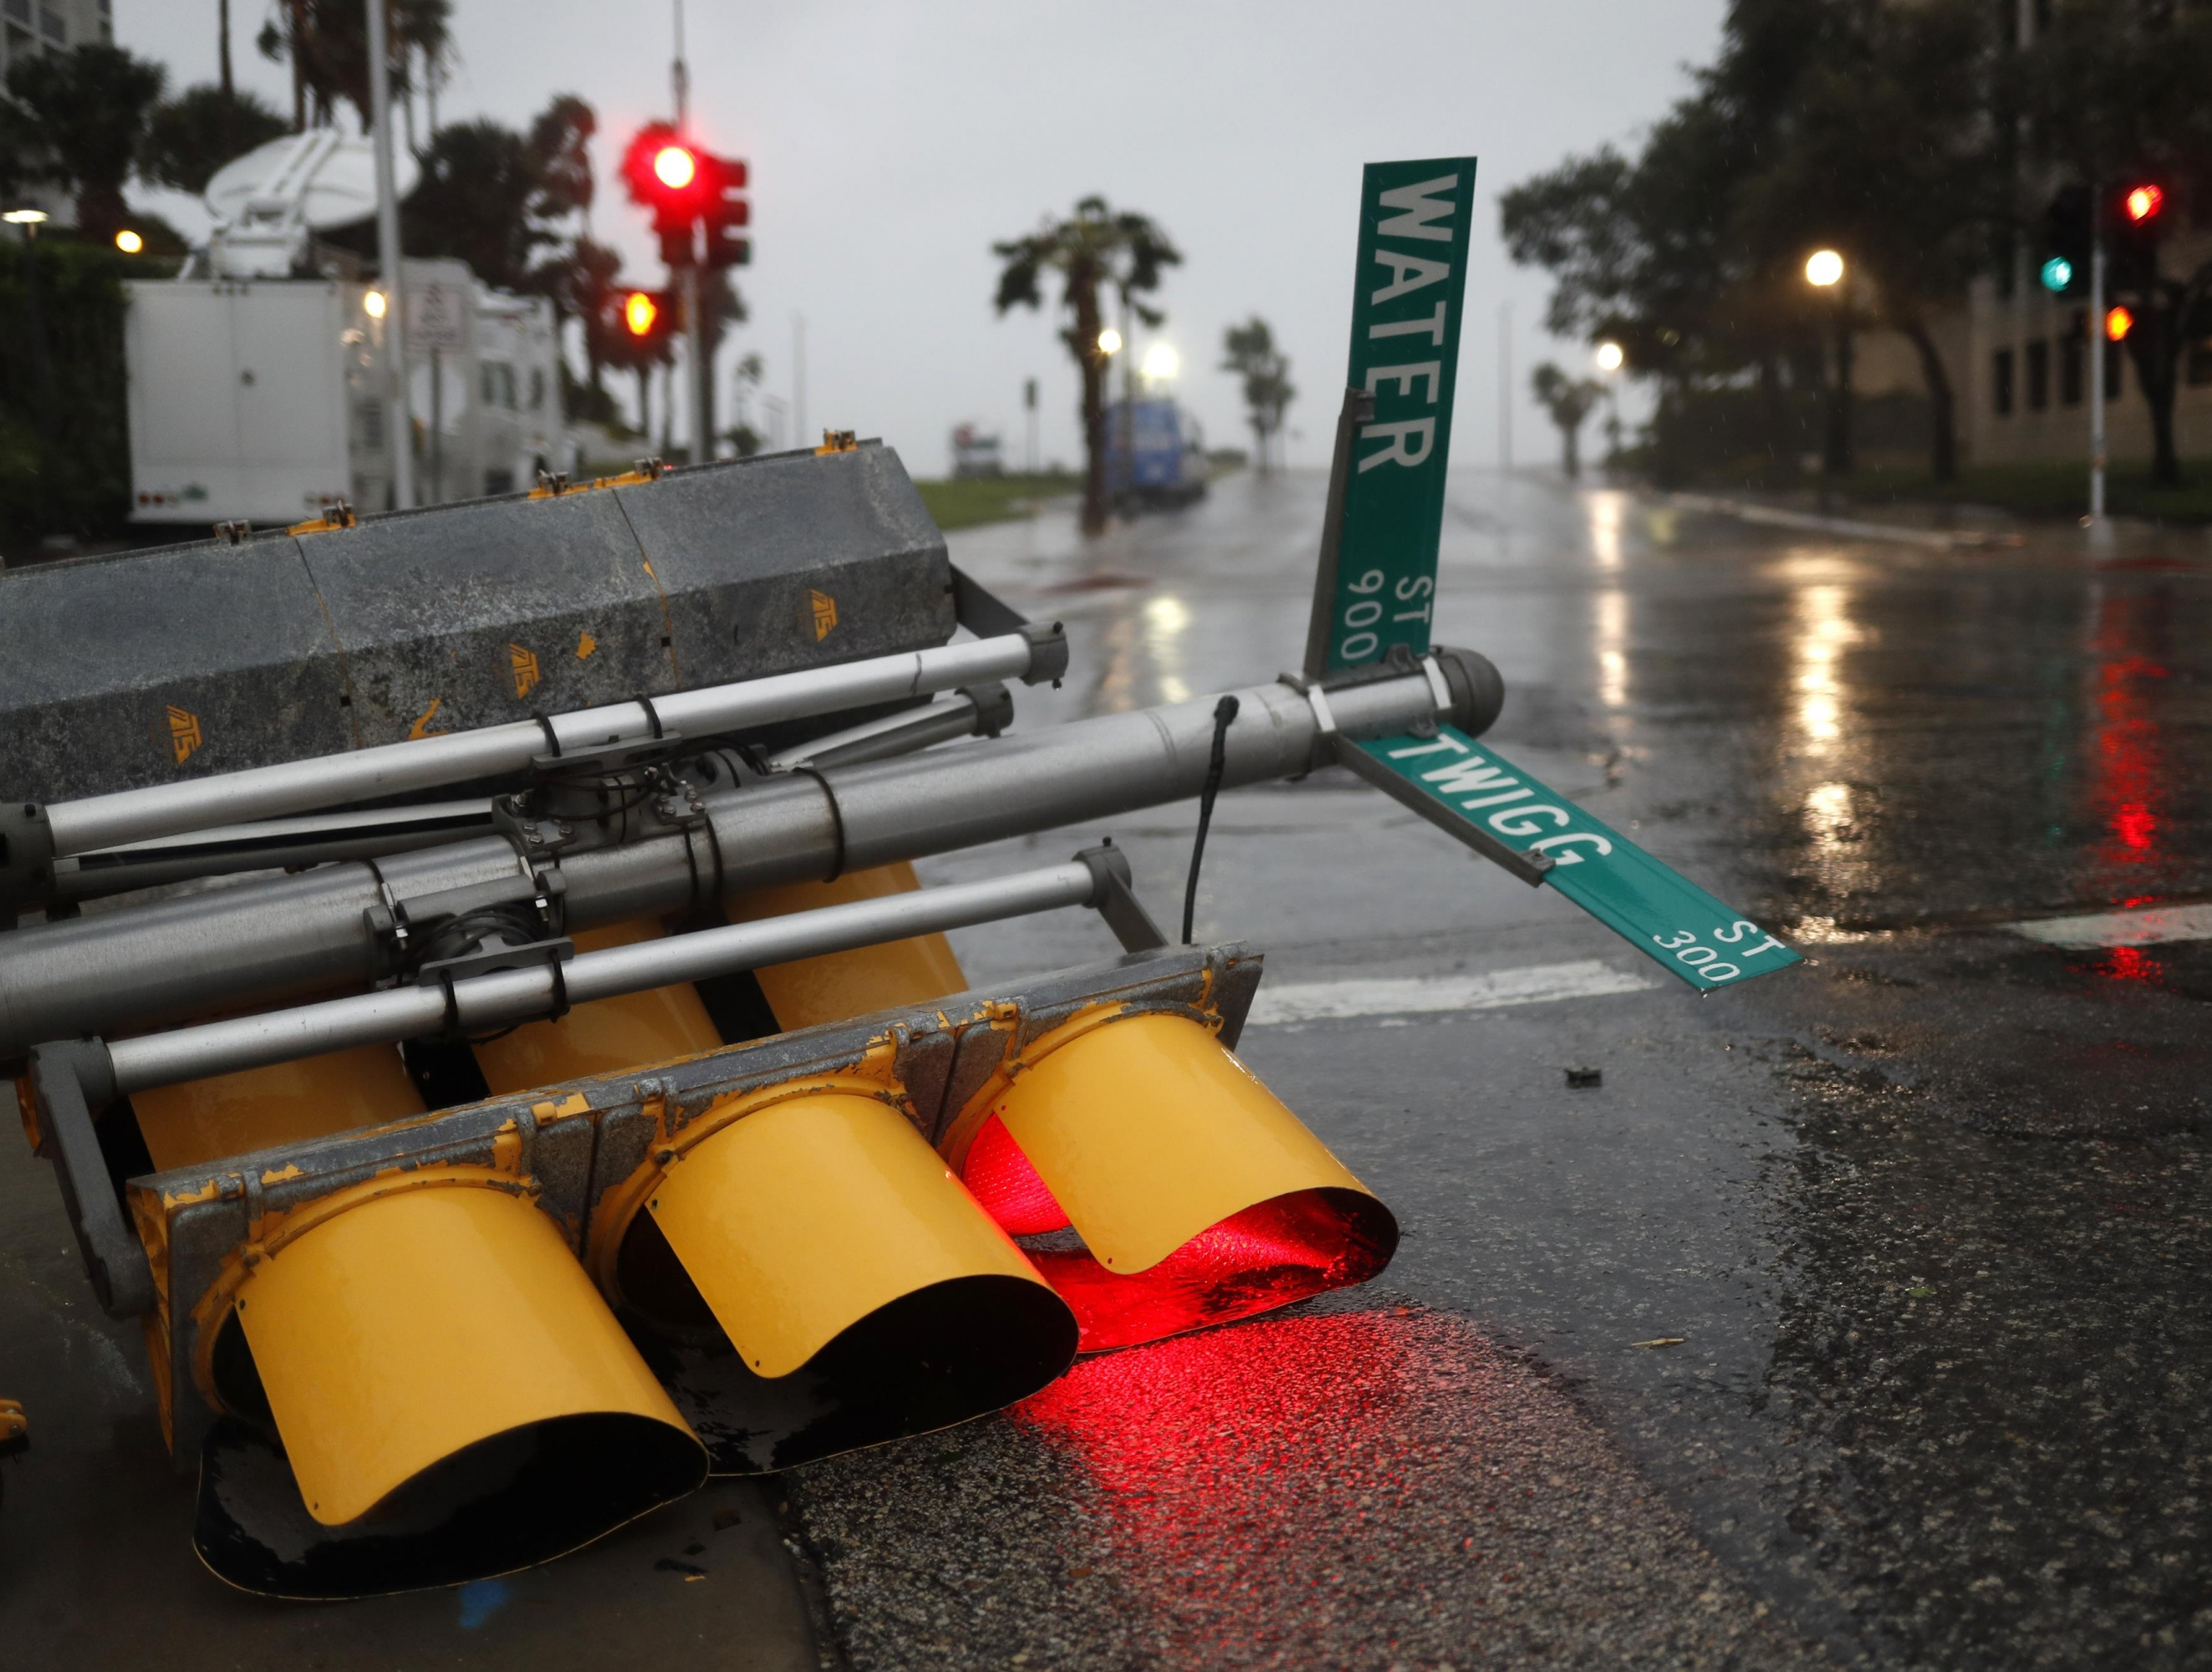 Harvey amenaza con sembrar caos en Luisiana tras devastar Texas